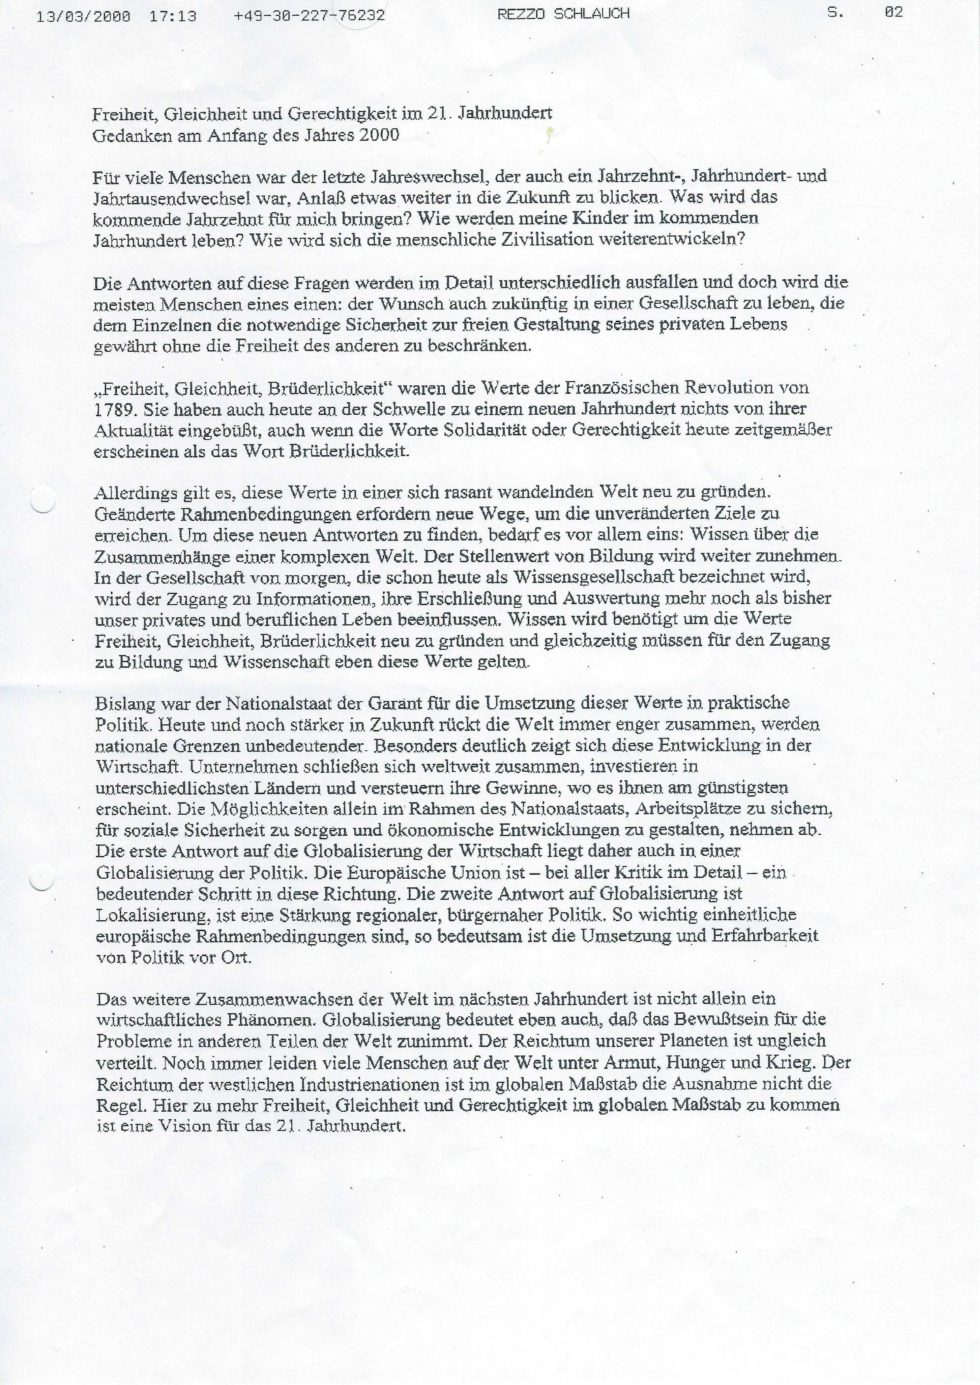 Säulen_Texte_Seite_27